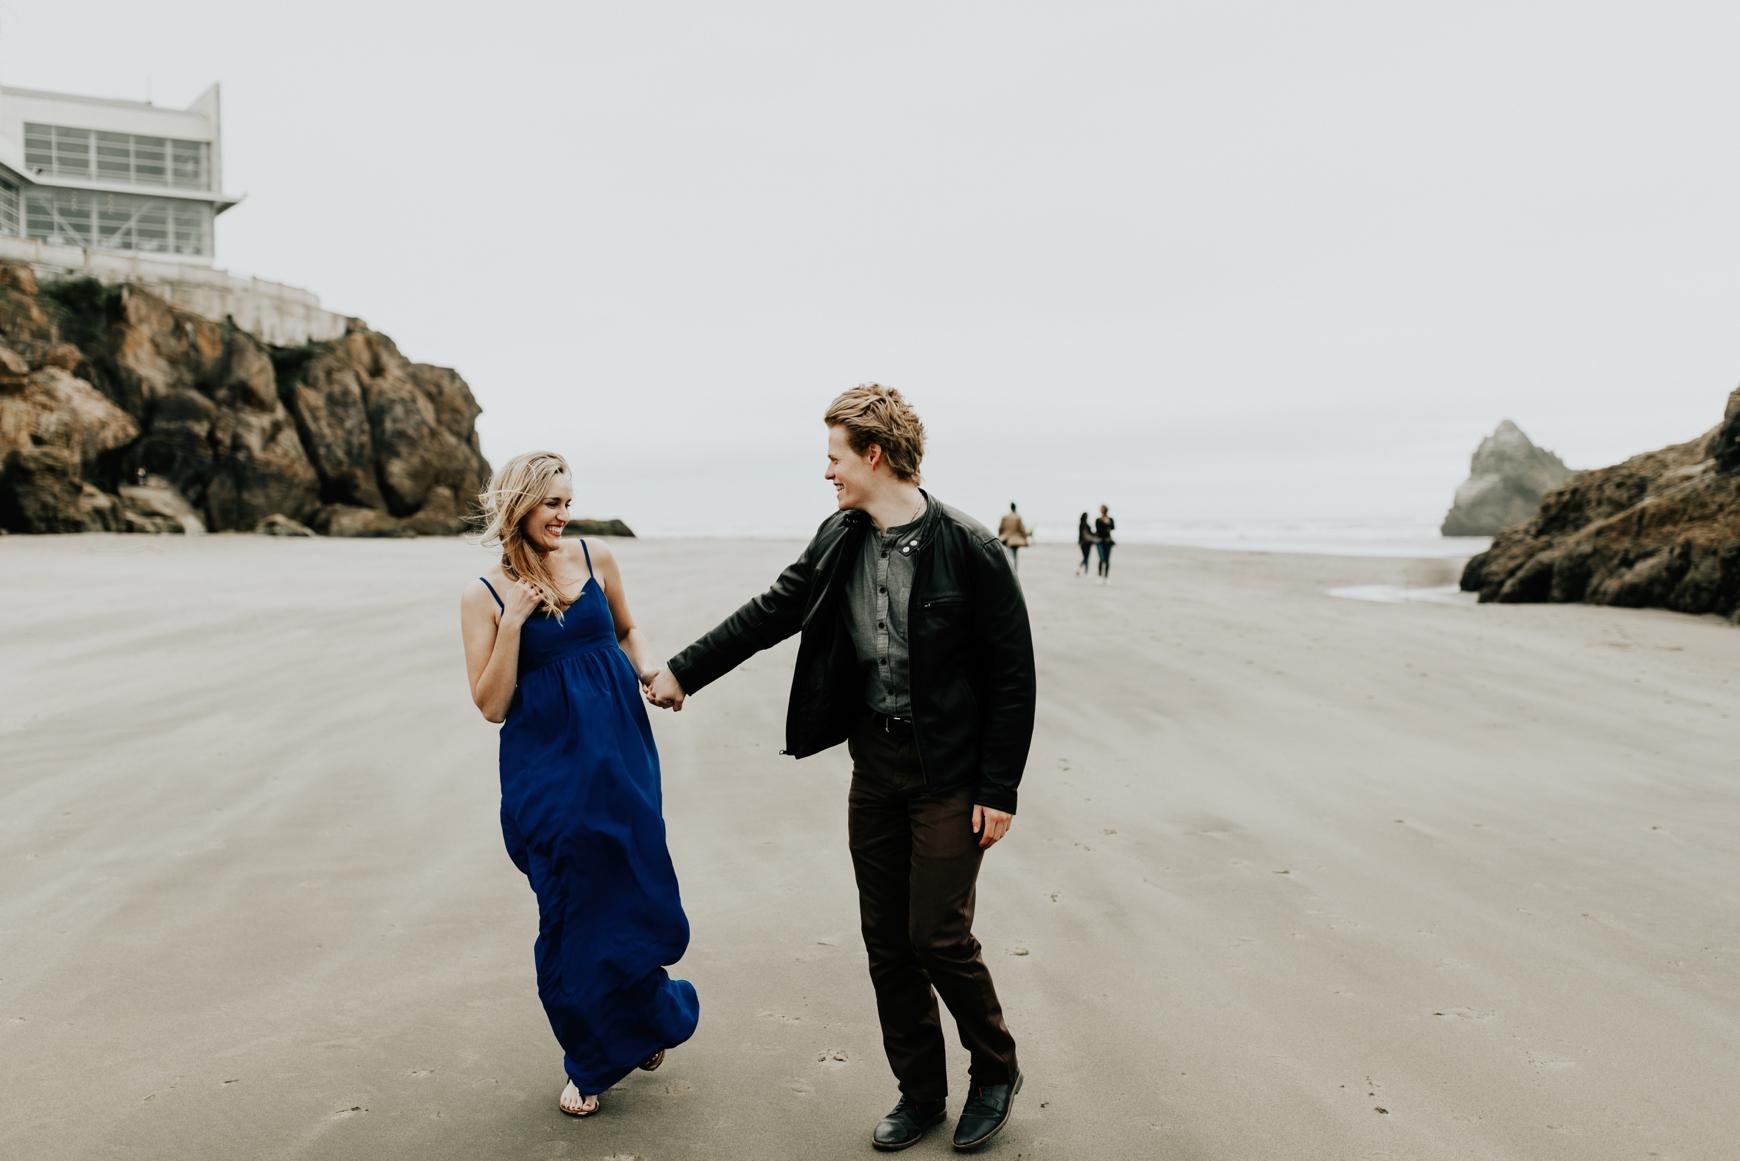 Sutro Baths Engagement Jessica & Ian Emily Magers Photography-92Emily Magers Photography.jpg